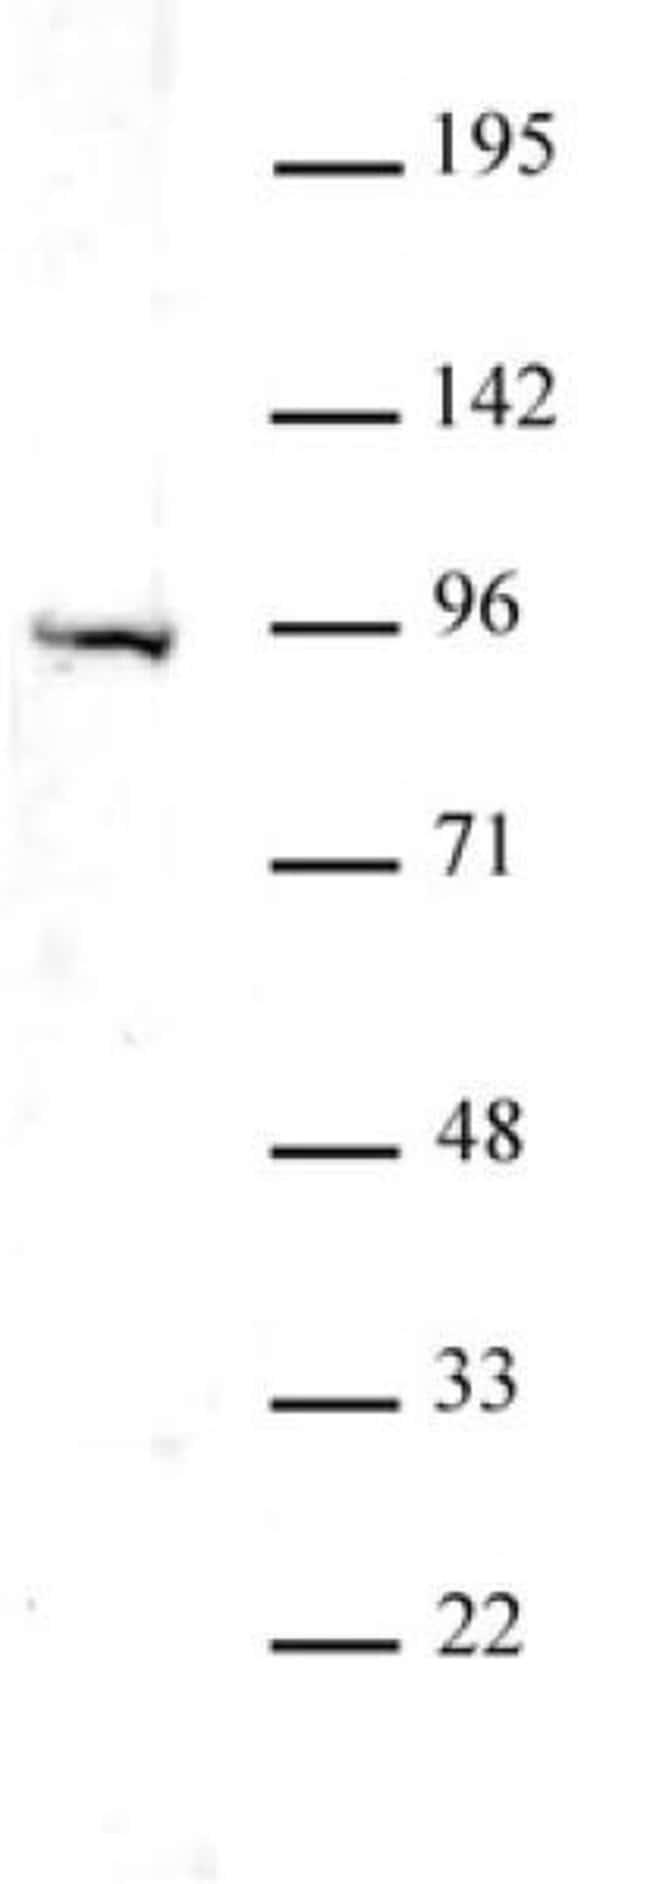 Uhrf1 Rabbit anti-Human, Unconjugated, Polyclonal, Active Motif:Antibodies:Primary